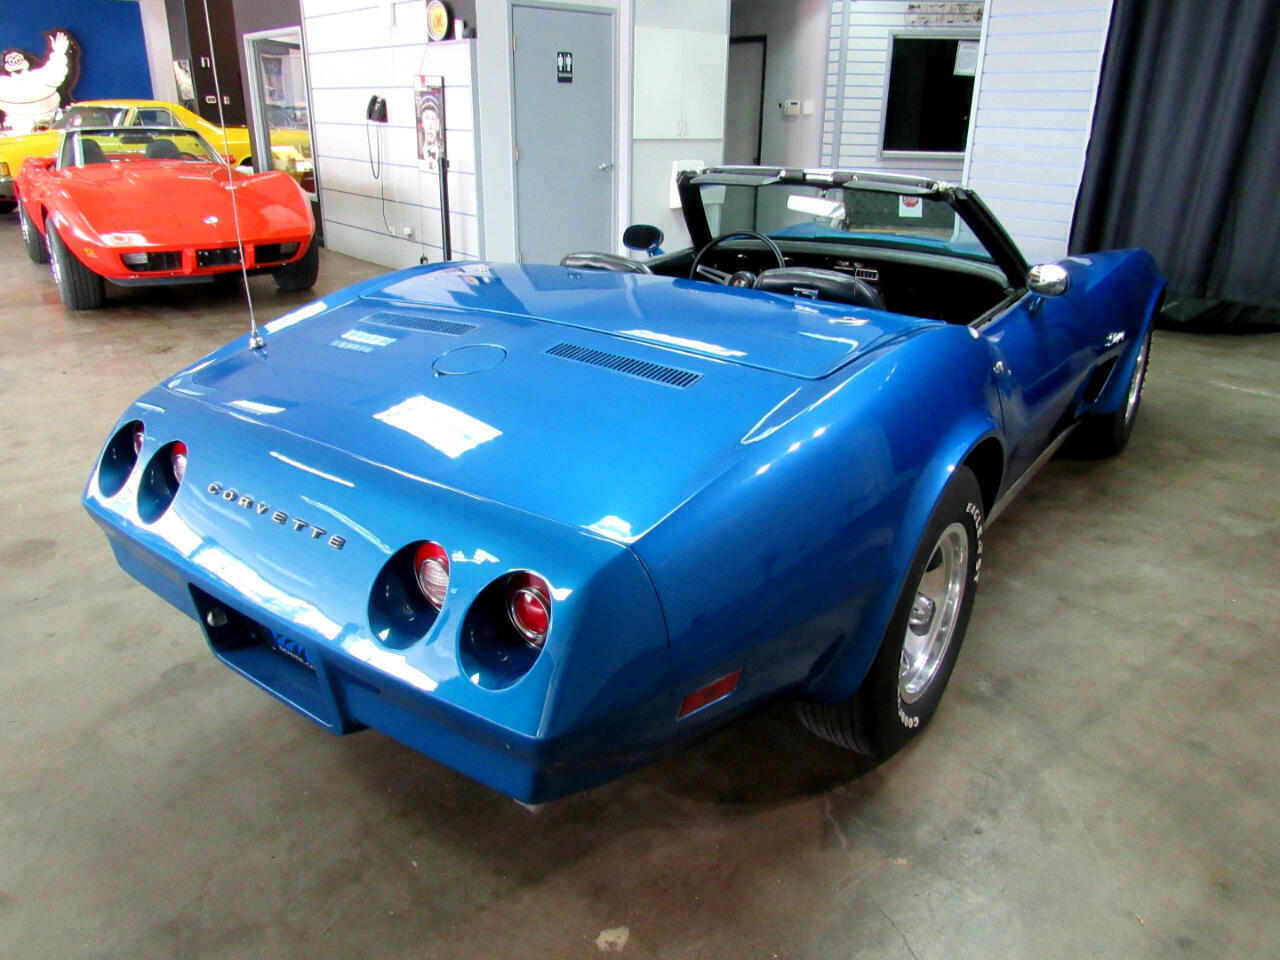 1974 Blue Chevrolet Corvette Convertible  | C3 Corvette Photo 6